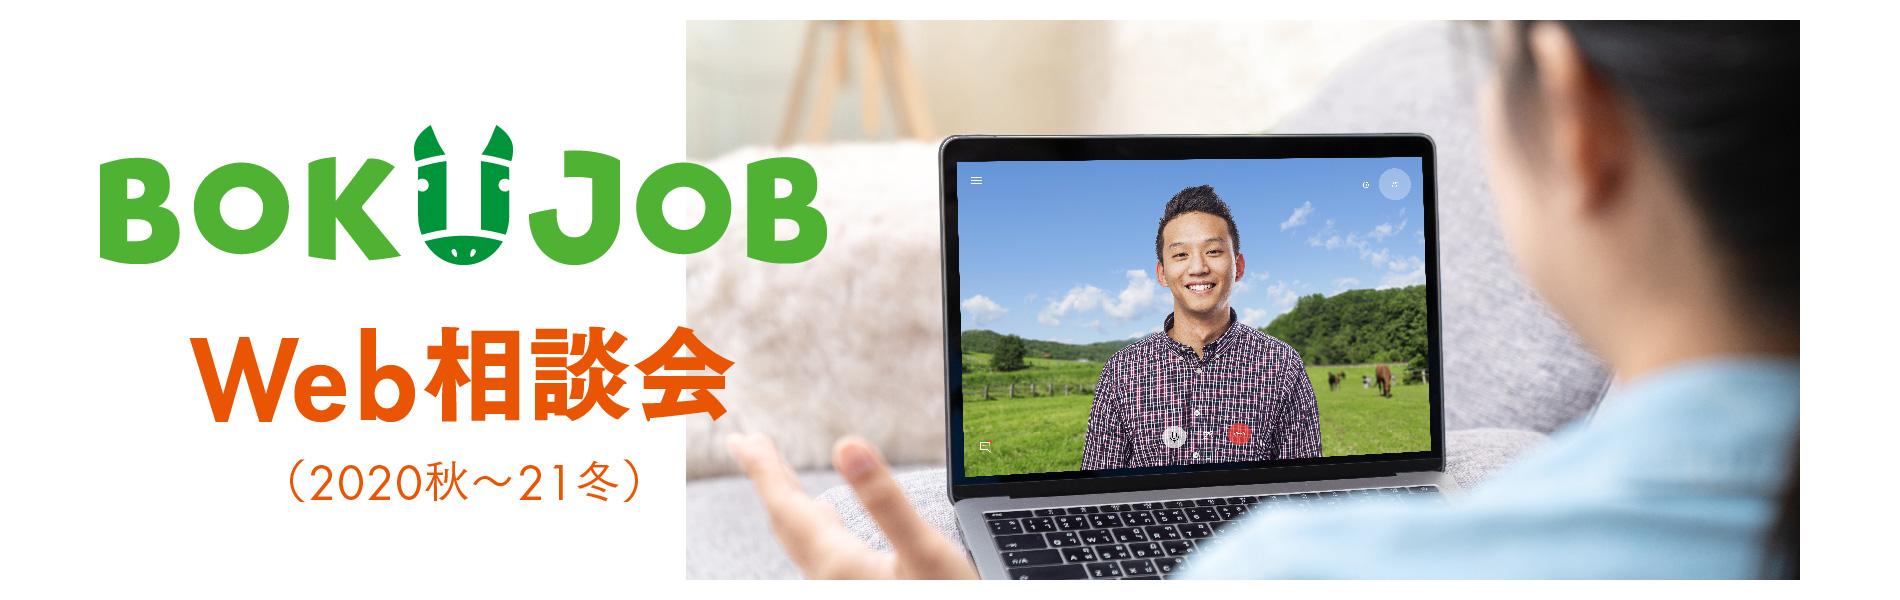 BOKUJOB Web相談会(牧場就業コース)